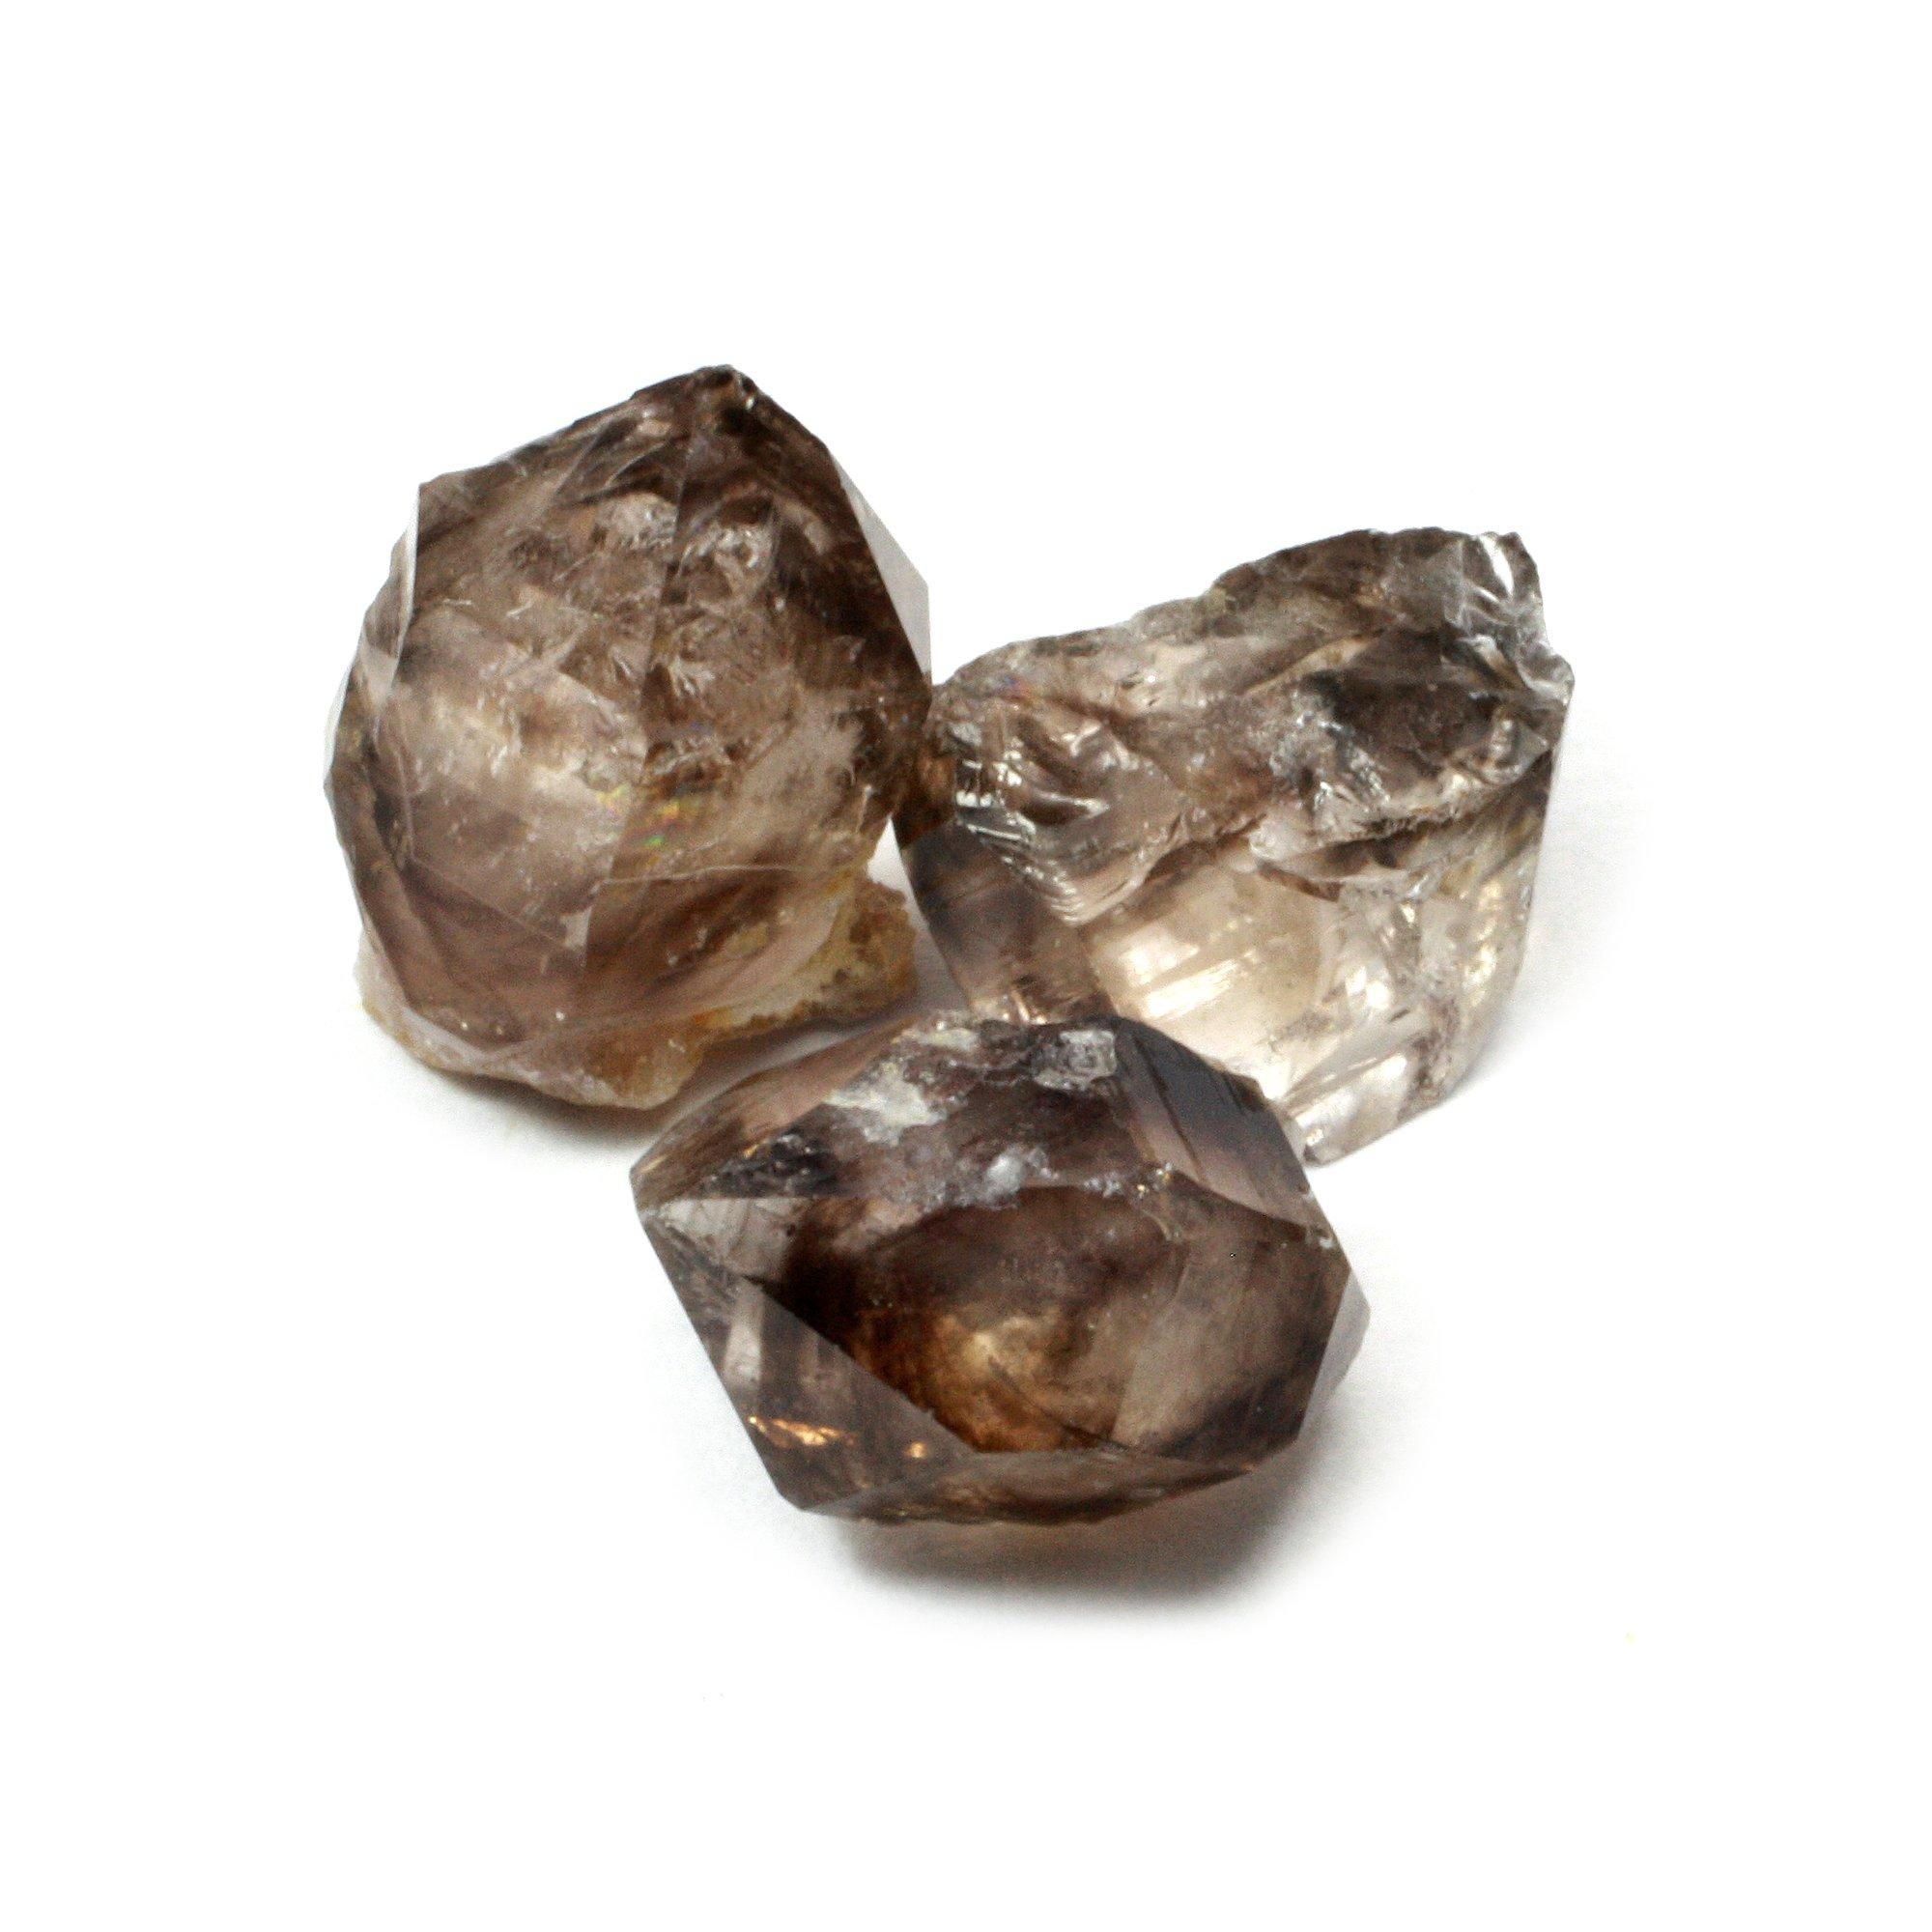 Smoky Quartz Healing Crystal DE LA JIPI Crystal Practitioner